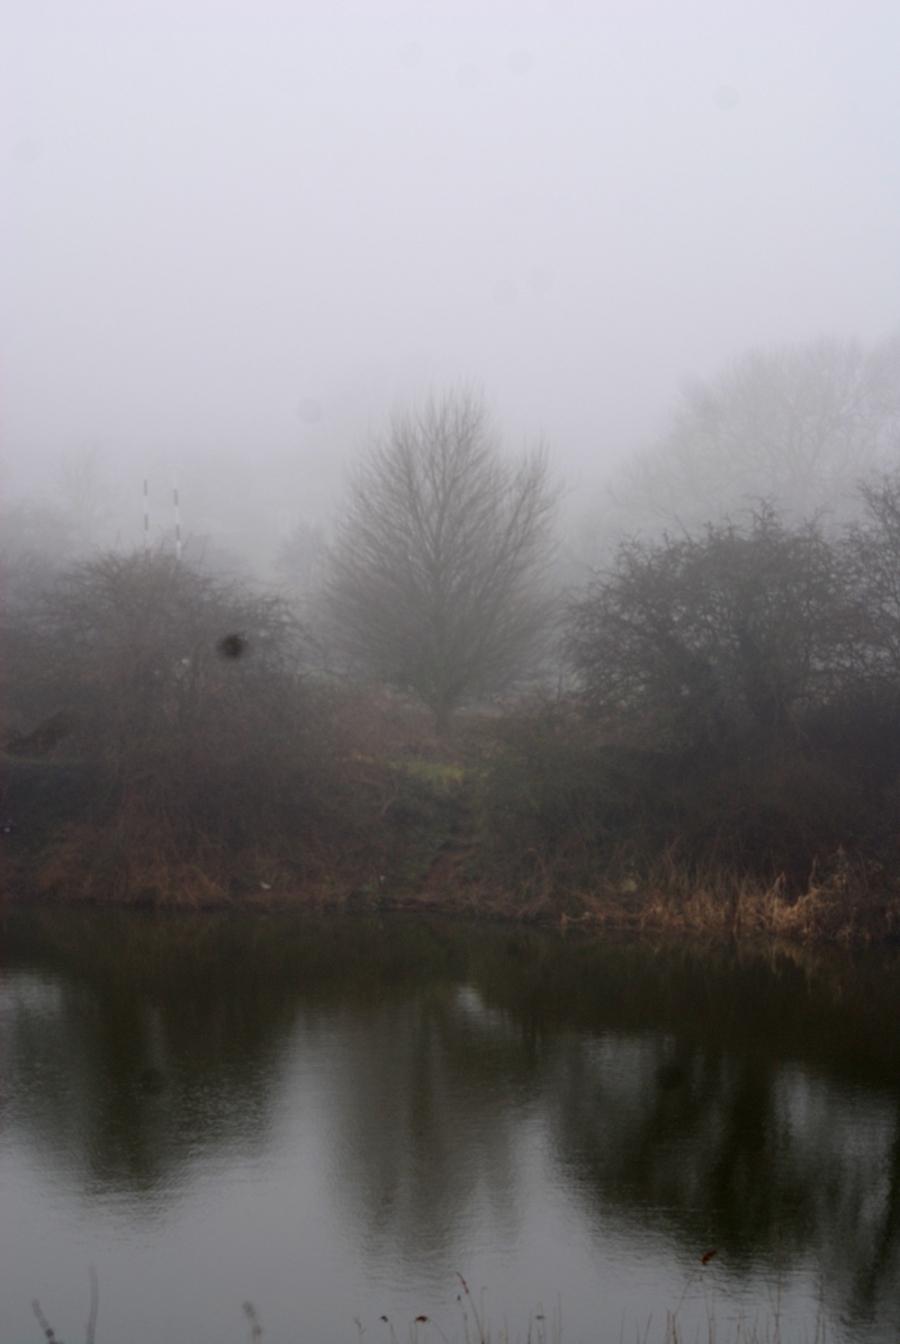 (Mist over Godfrey's pond)